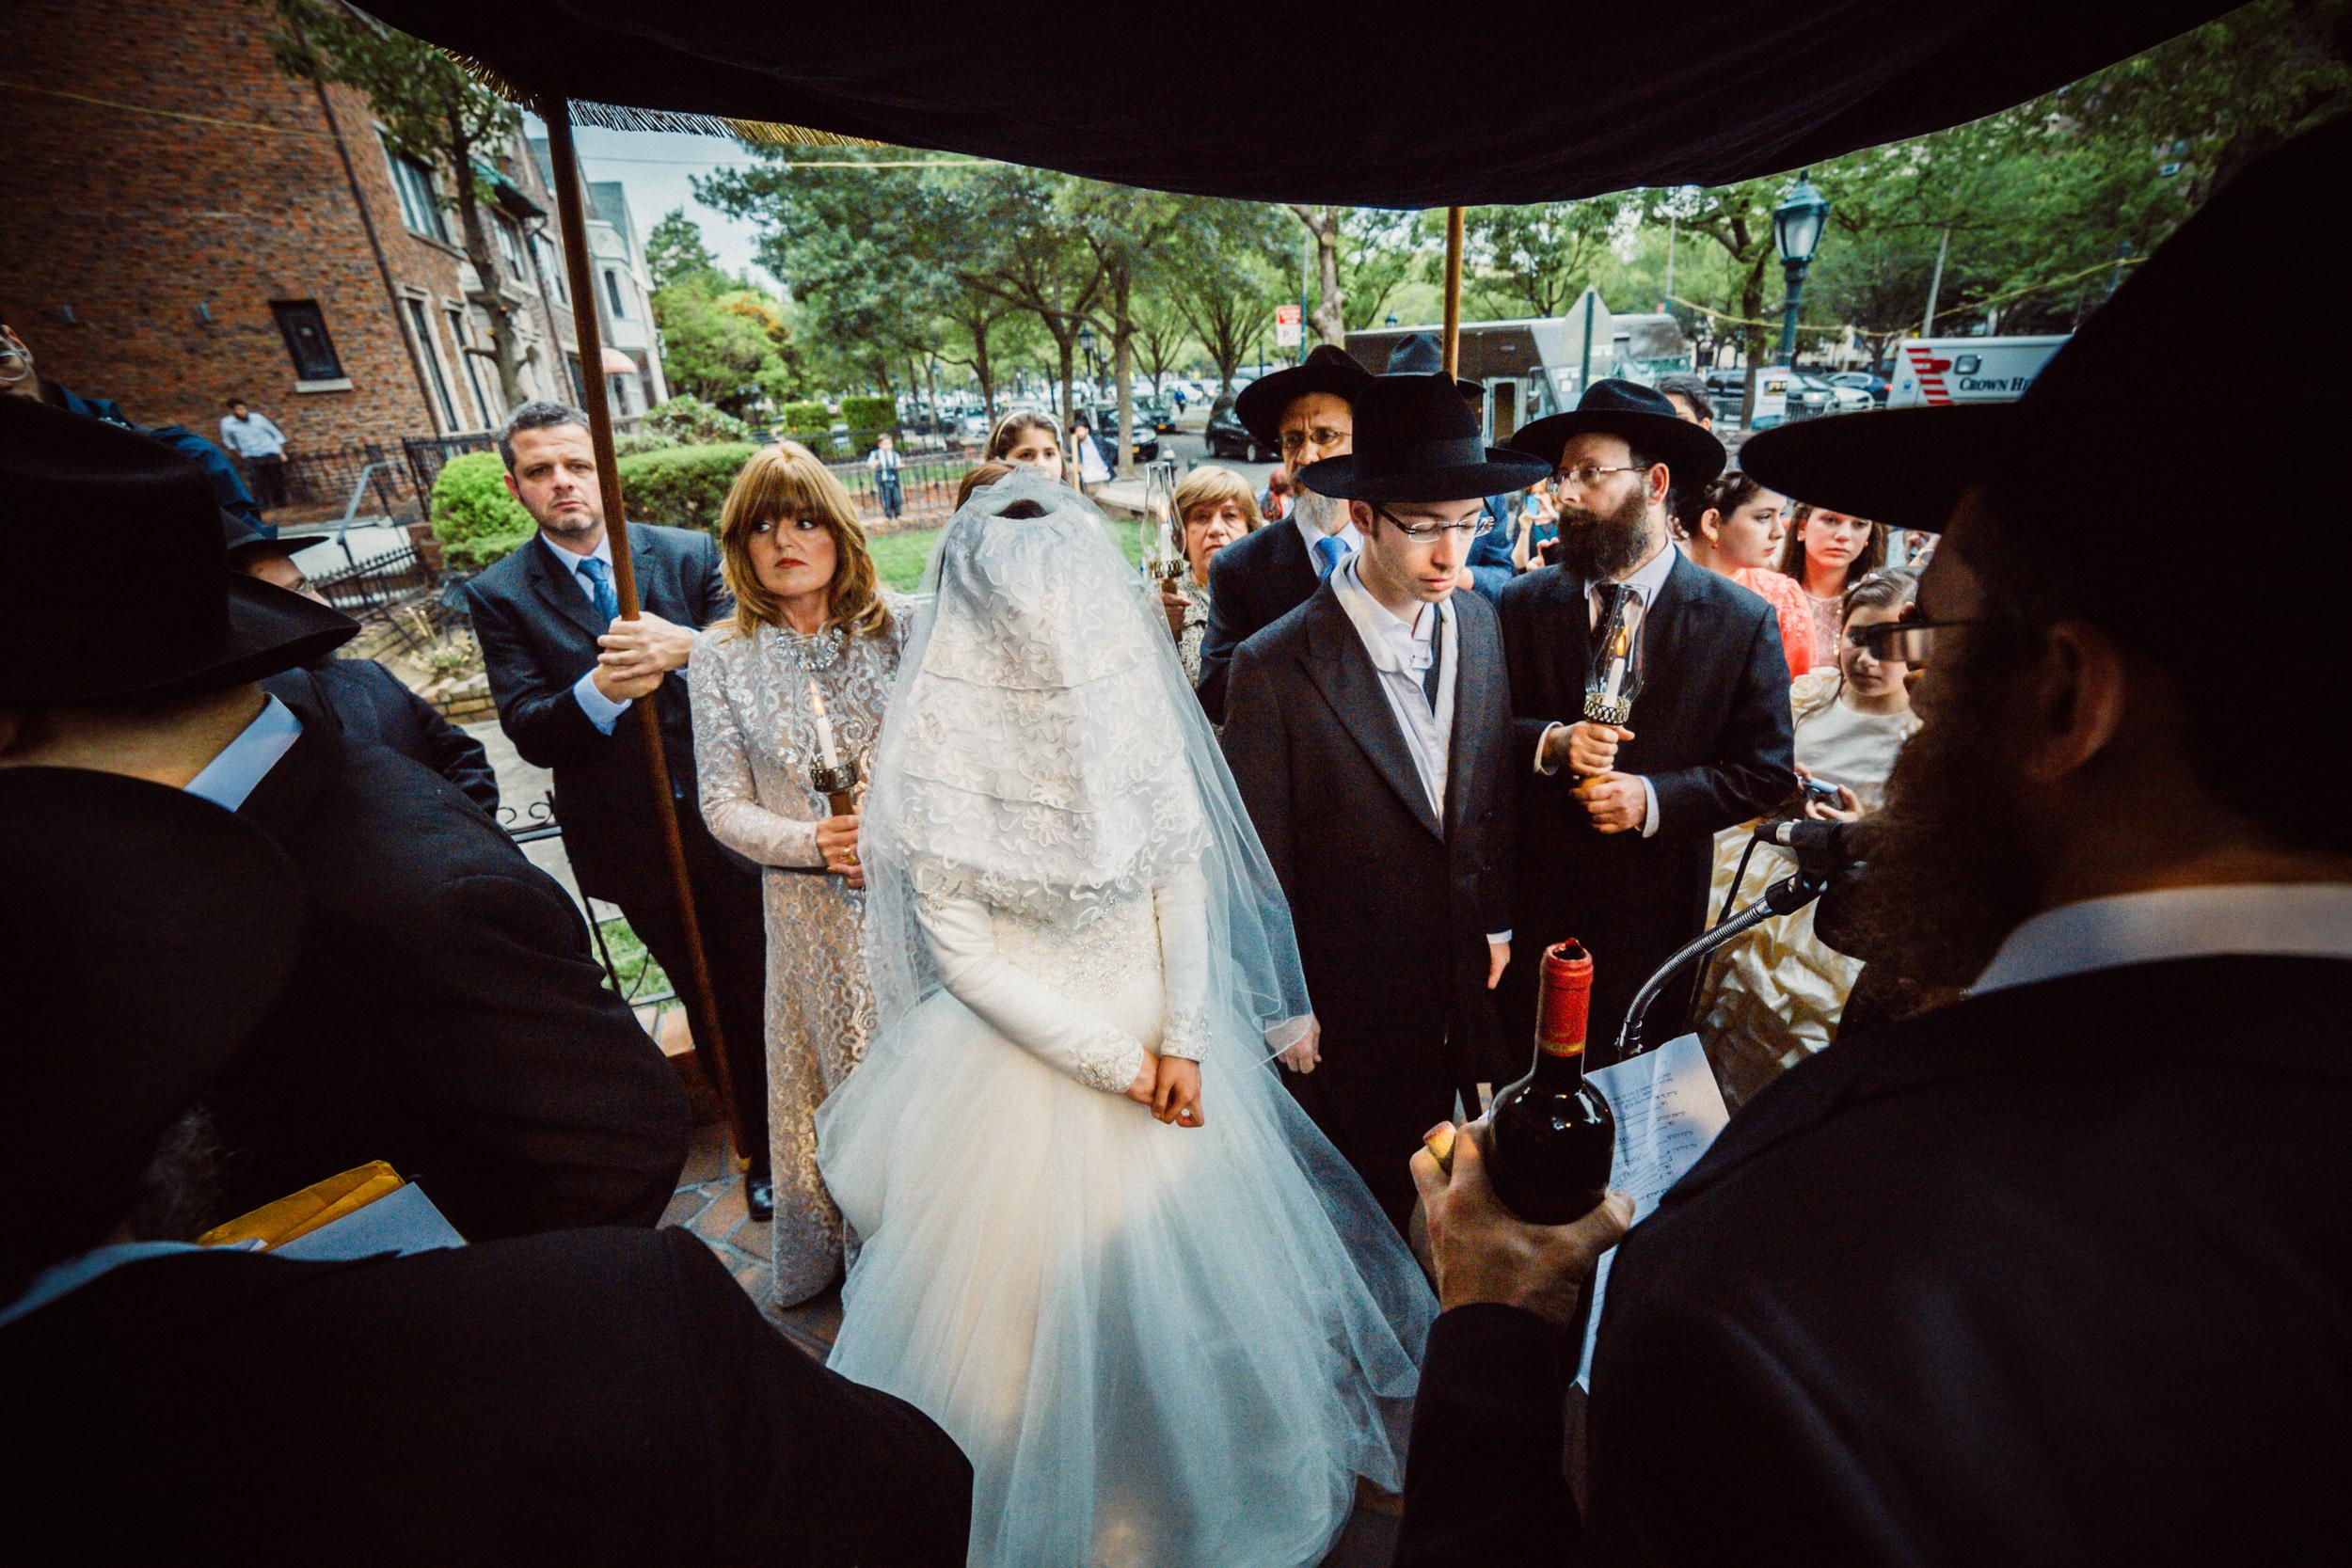 Wedding Iossi and Gitty Khafif  - Eliau Piha studio photography, new york, events, people 770 brooklyn -0443.jpg